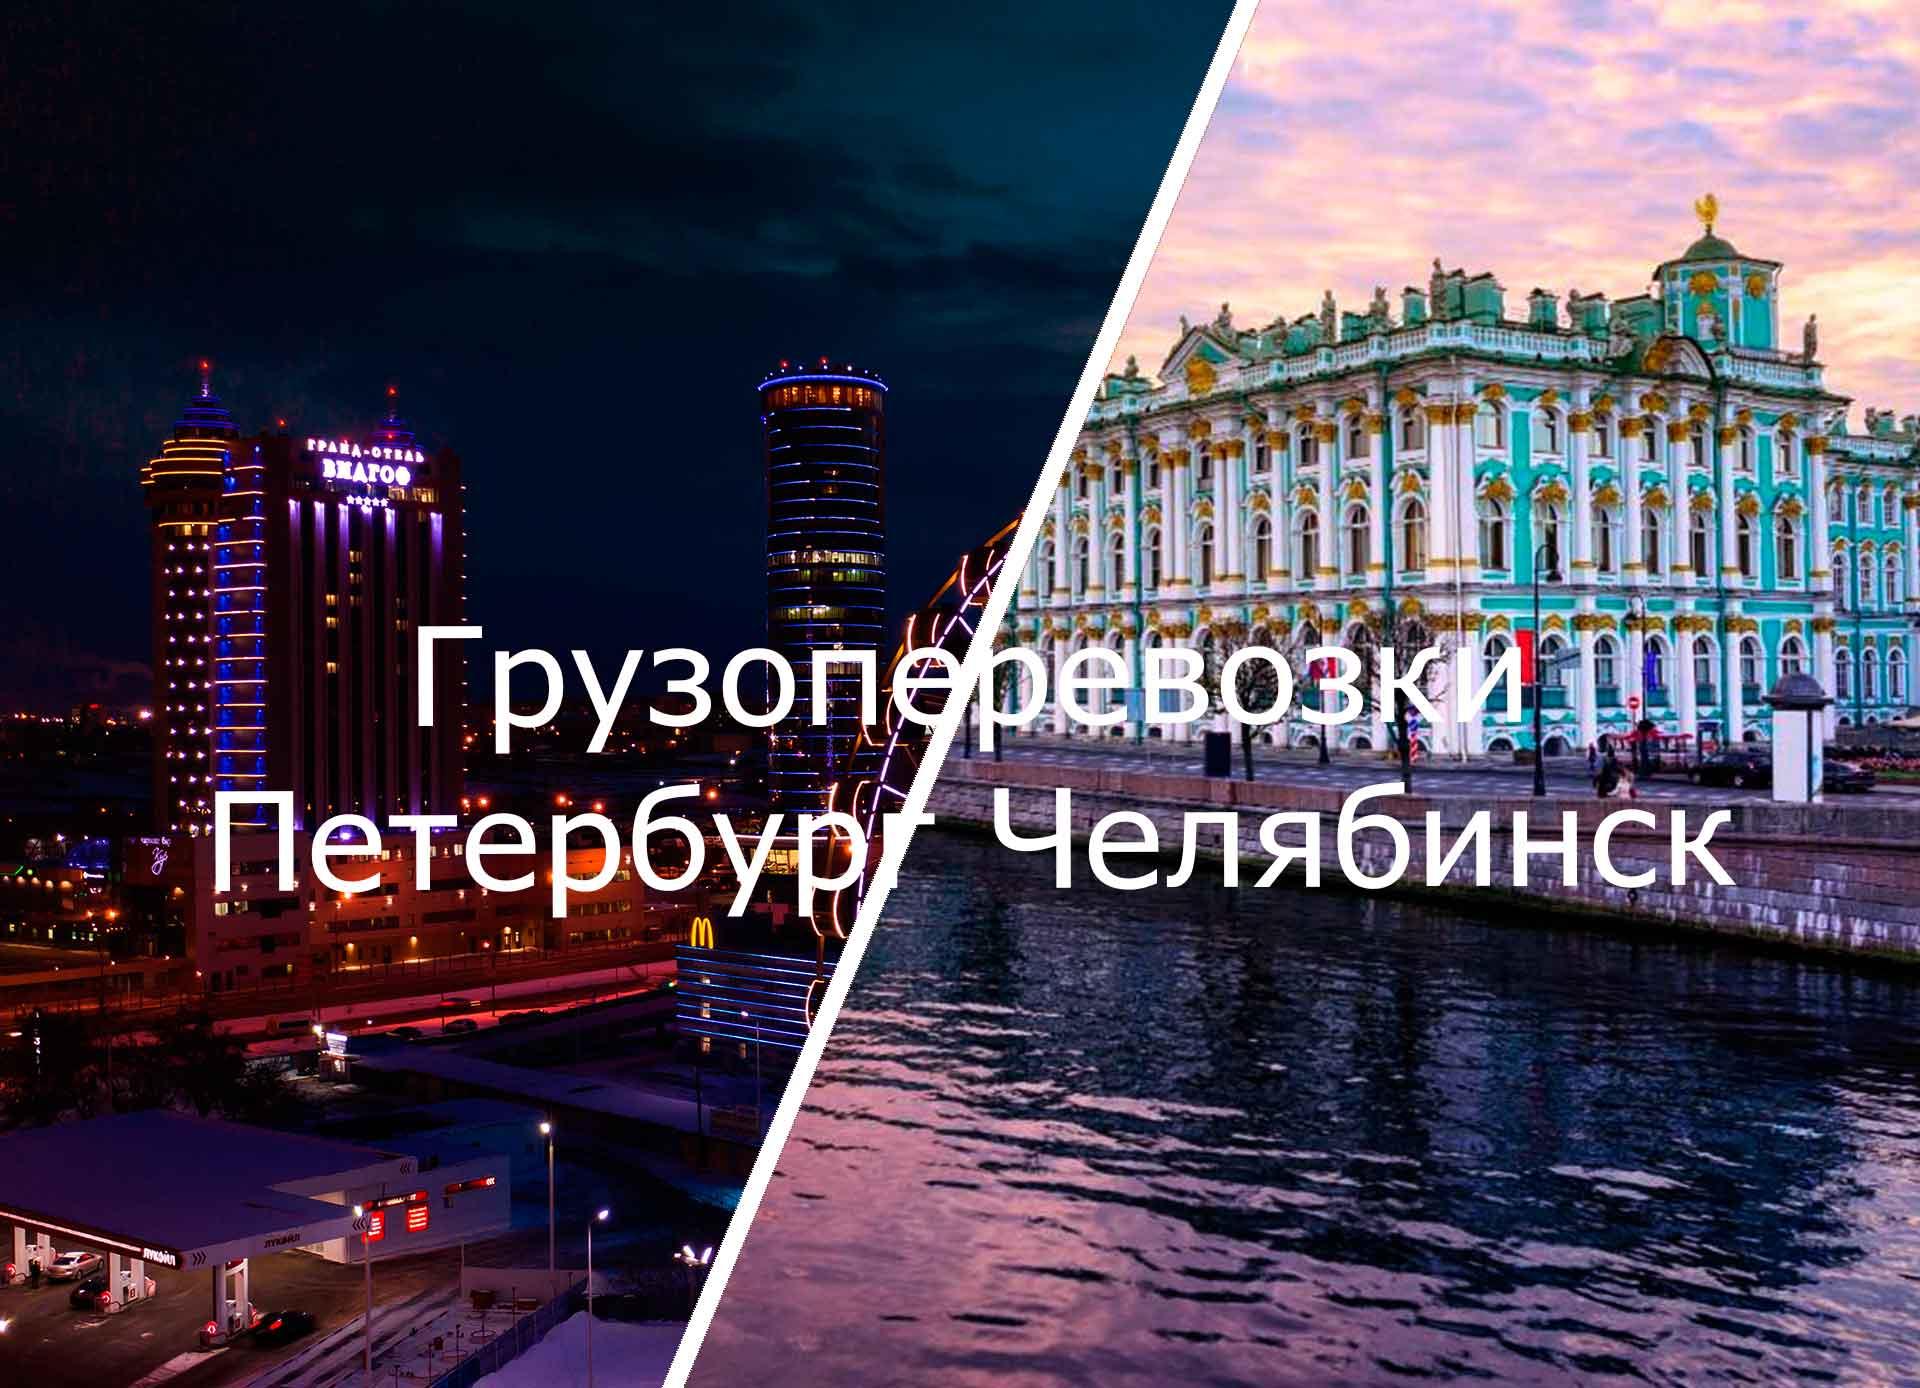 грузоперевозки петербург челябинск